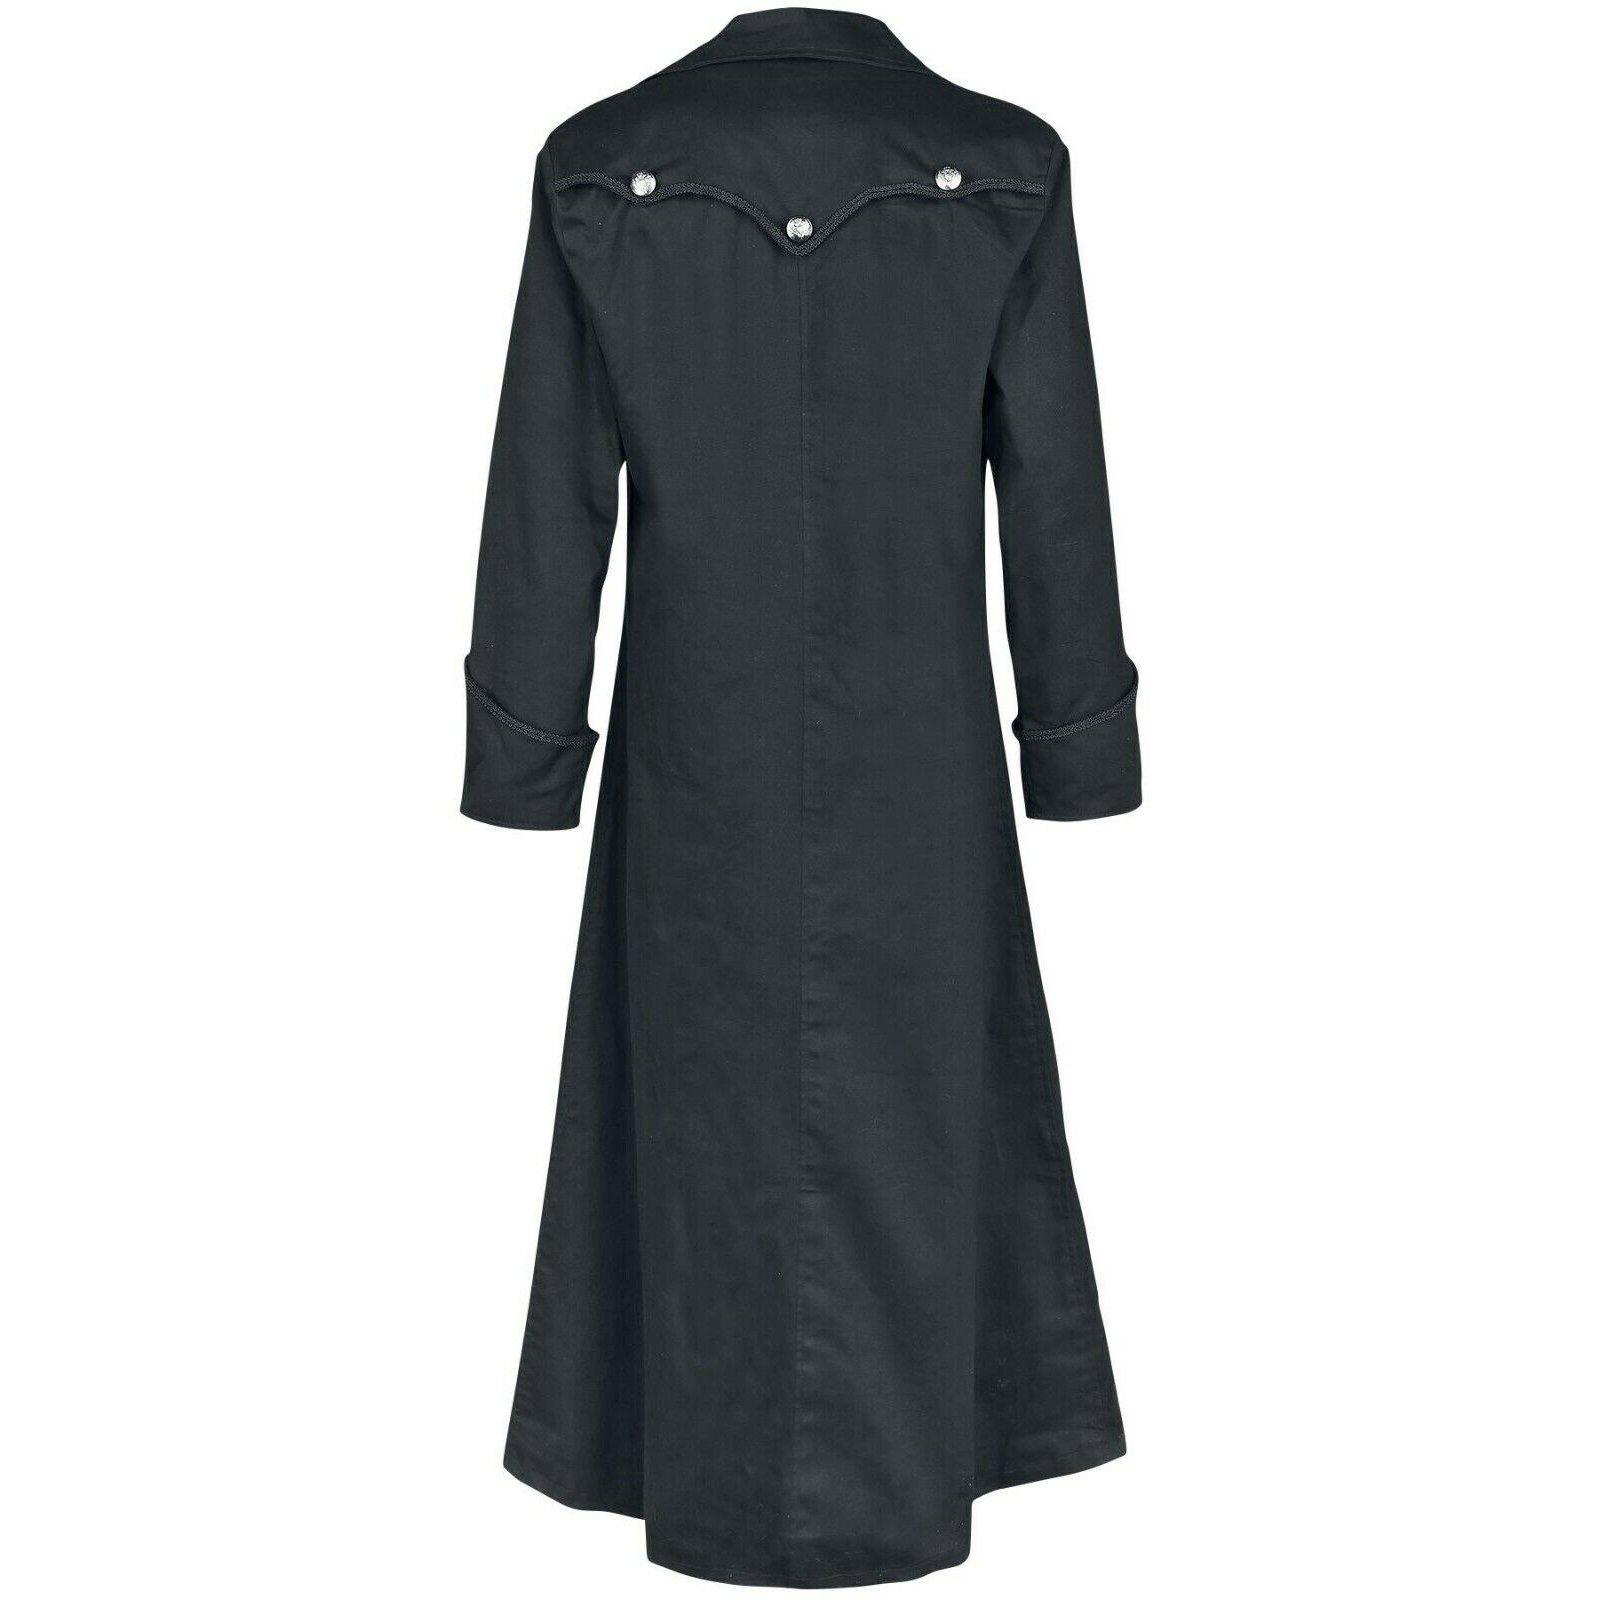 DARKROCK Gothic Steampunk Army Black Jacket Men's Punk Highwayman Regency Long Coat (1)